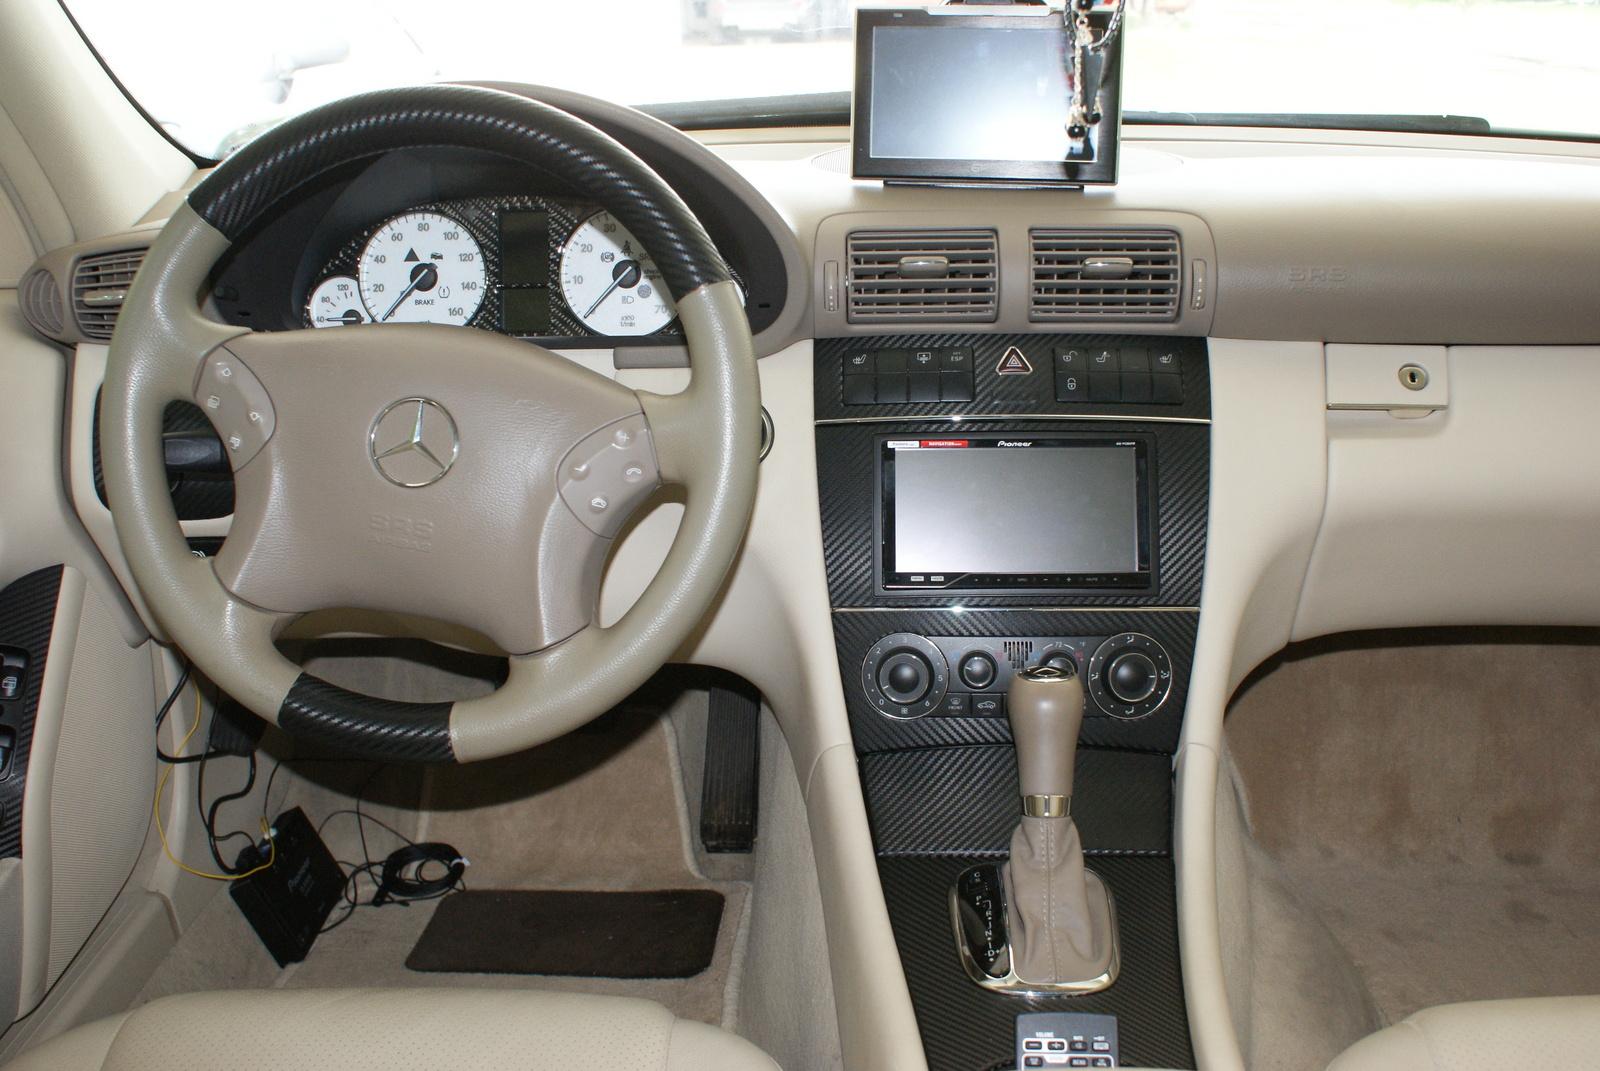 2006 Mercedes-benz C-class - Pictures